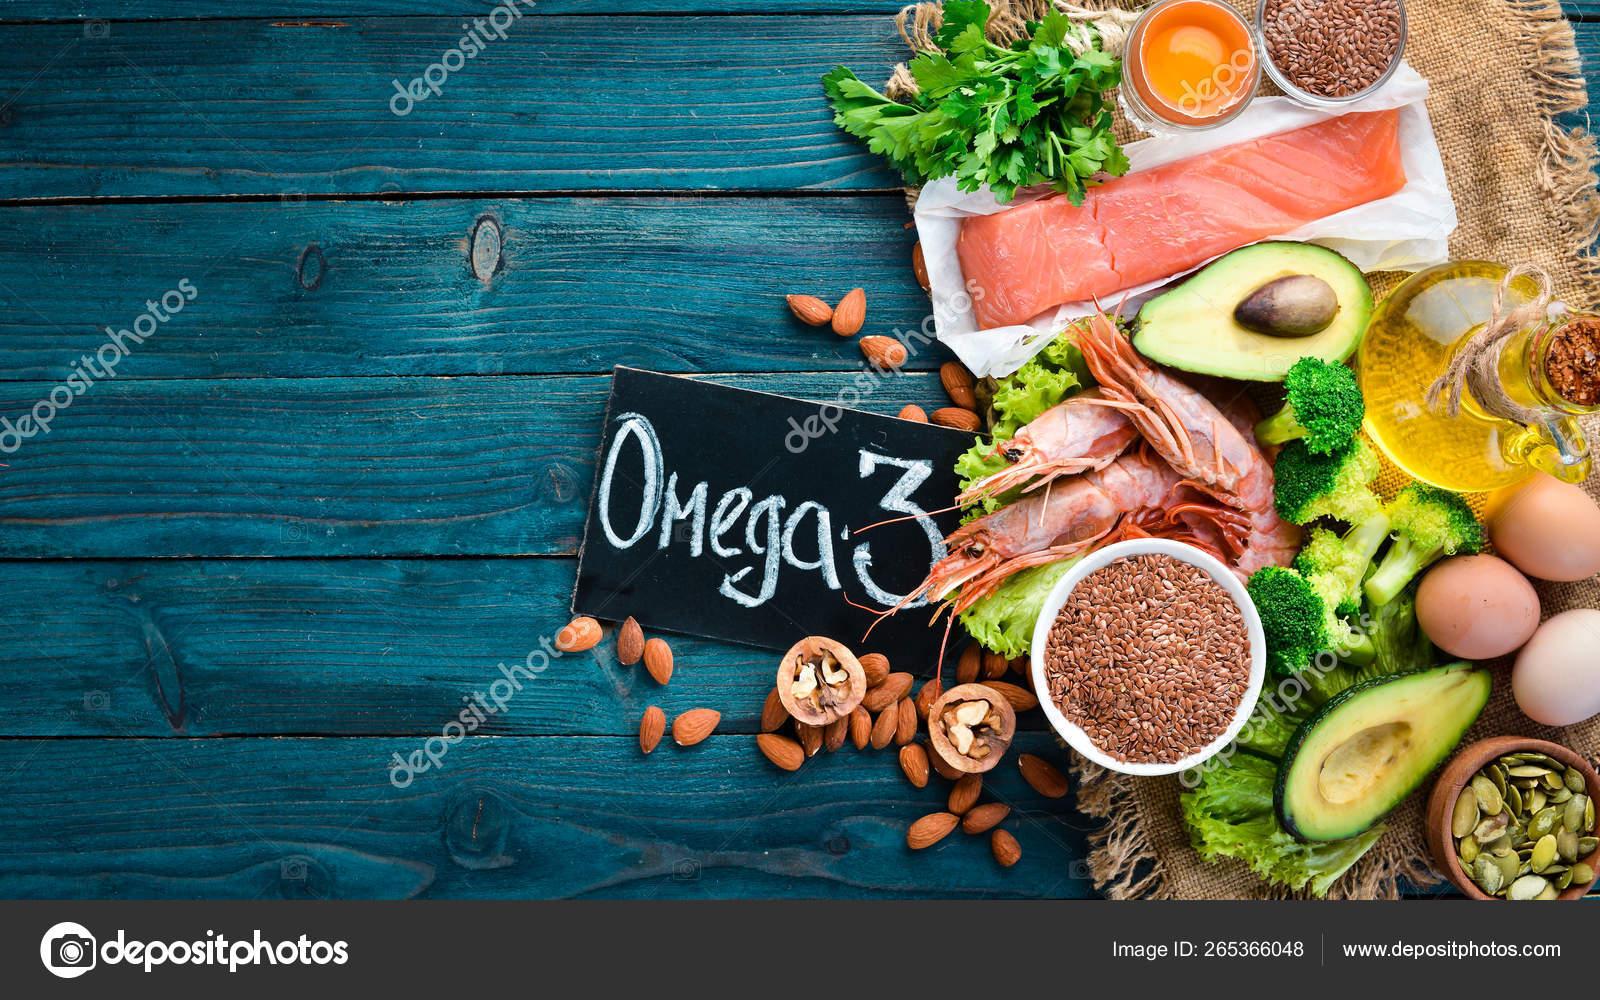 Foods Containing Omega Vitamin Healthy Foods Avocados Fish Shrimp Broccoli Stock Photo C Yarunivphoto 265366048